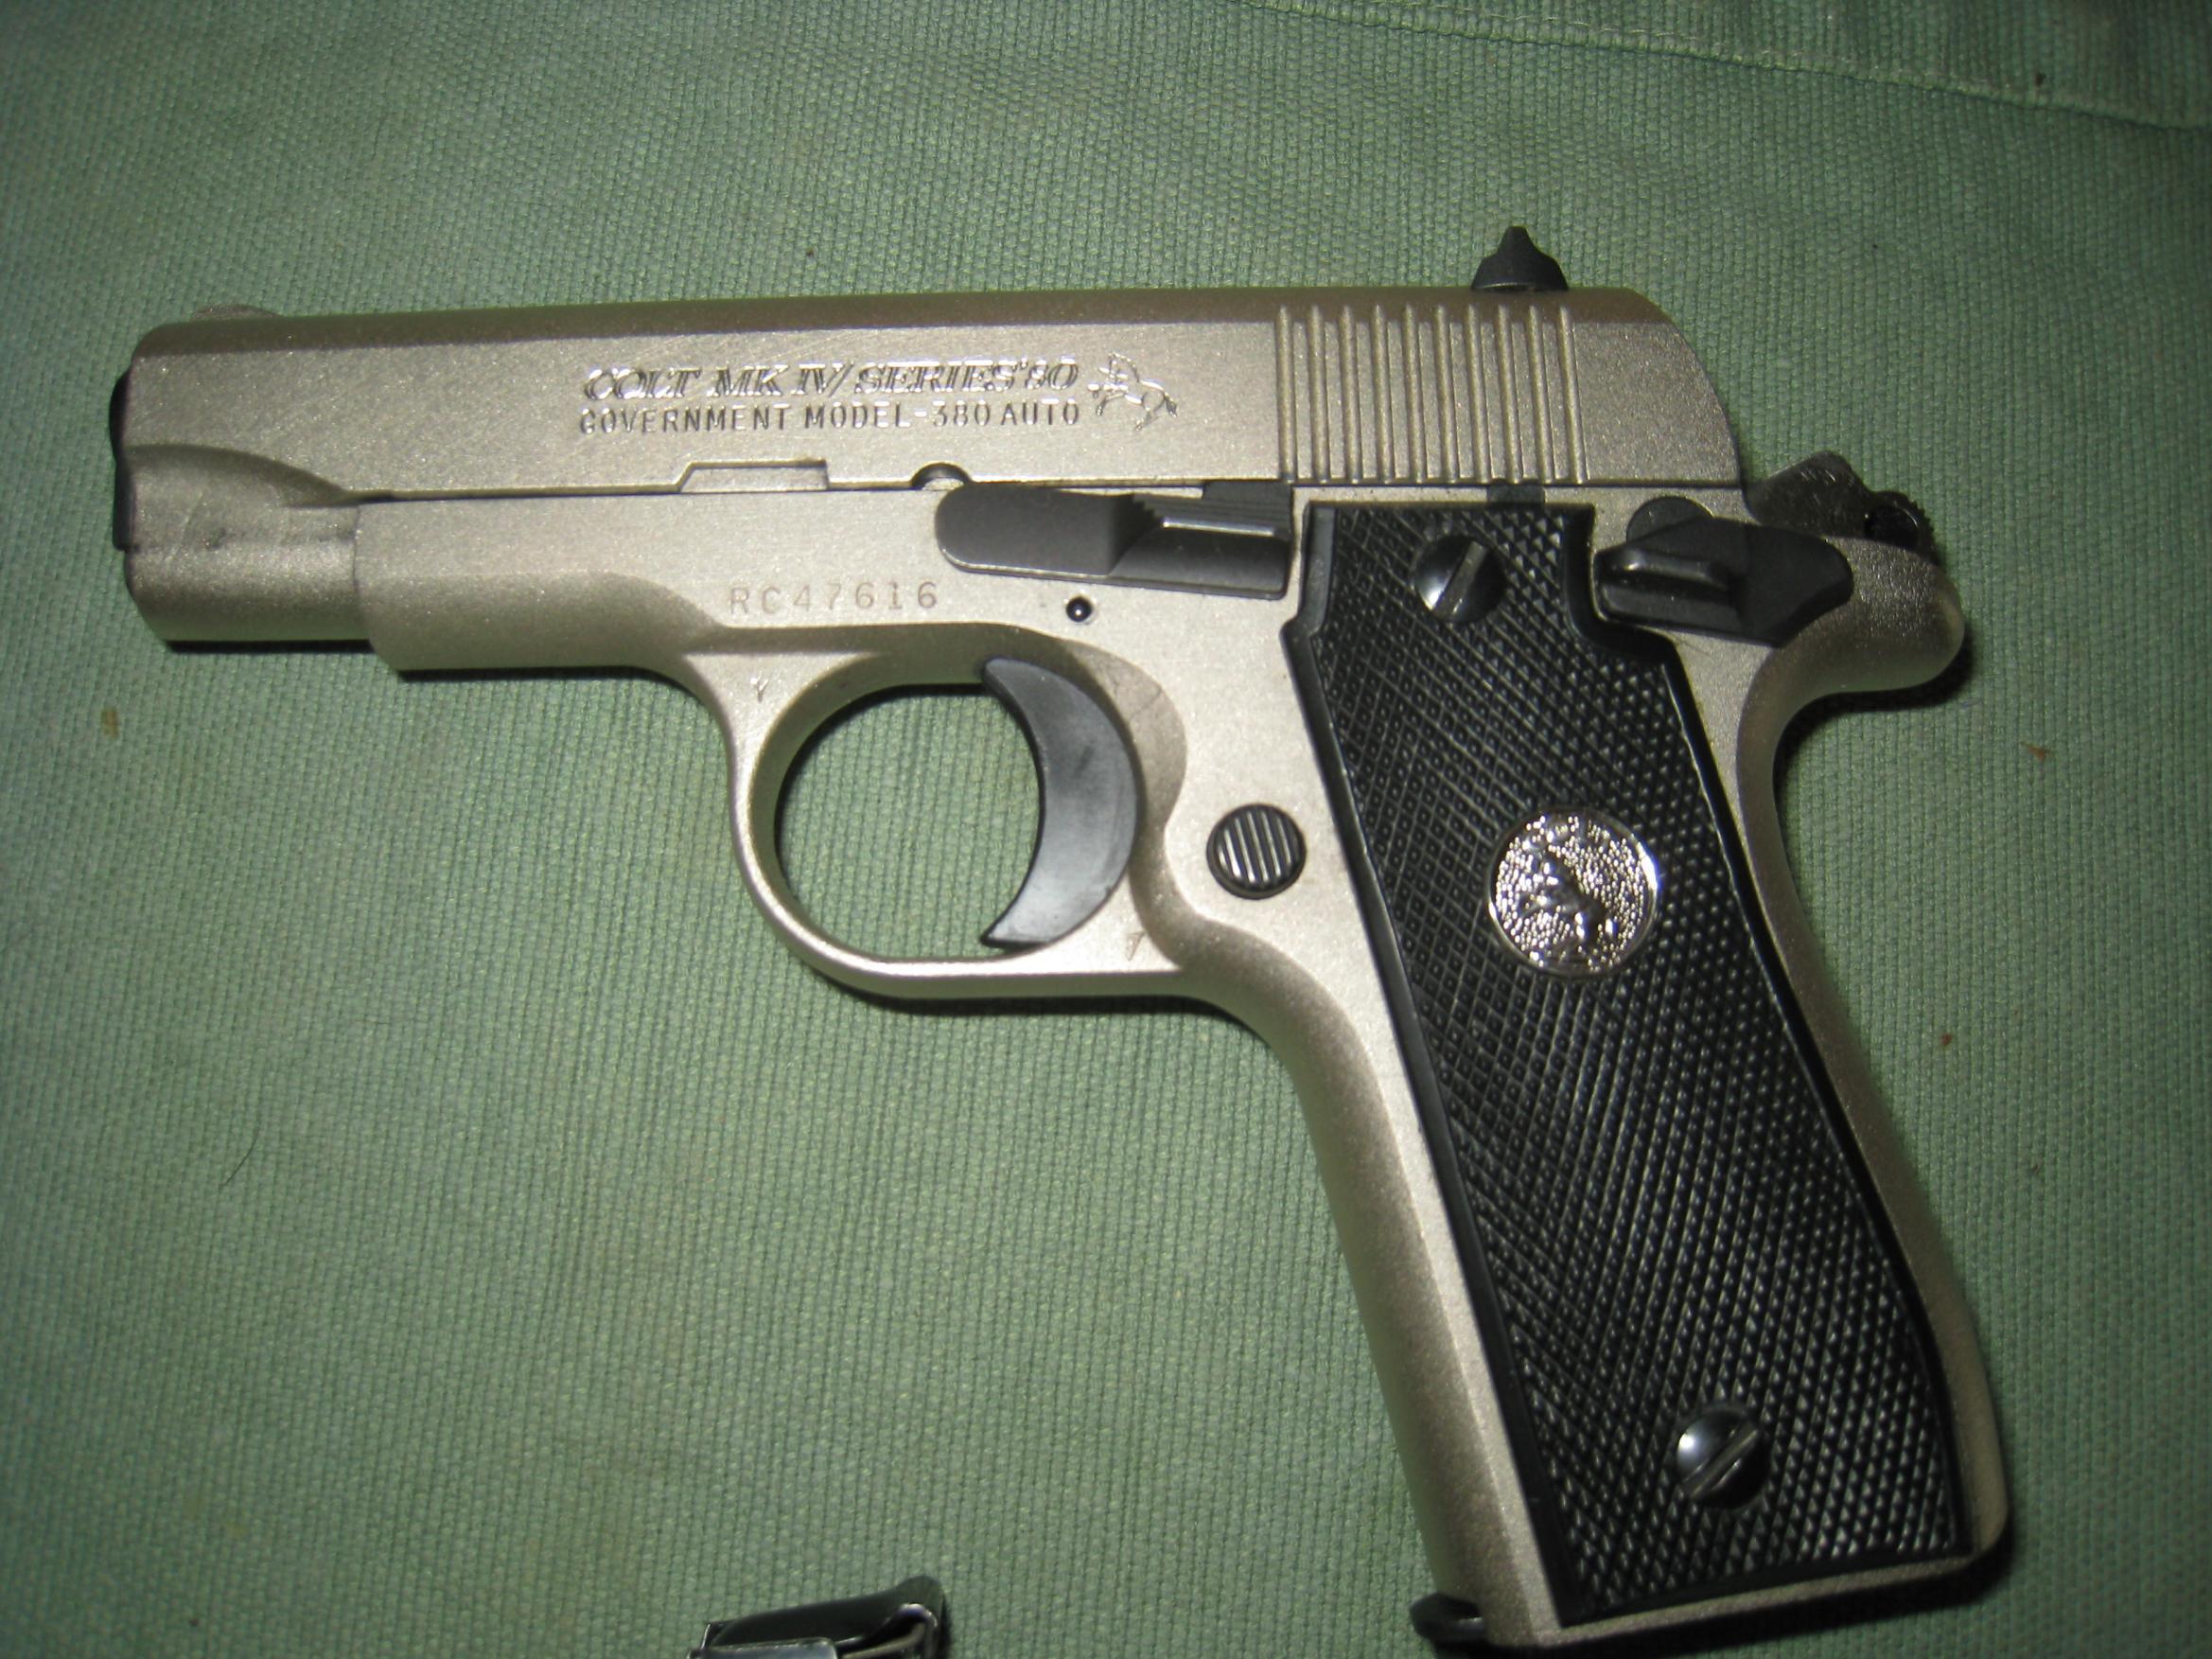 WTS Colt MkIV/Series 80 Govt. Model 380. - [KY]-img_0769.jpg